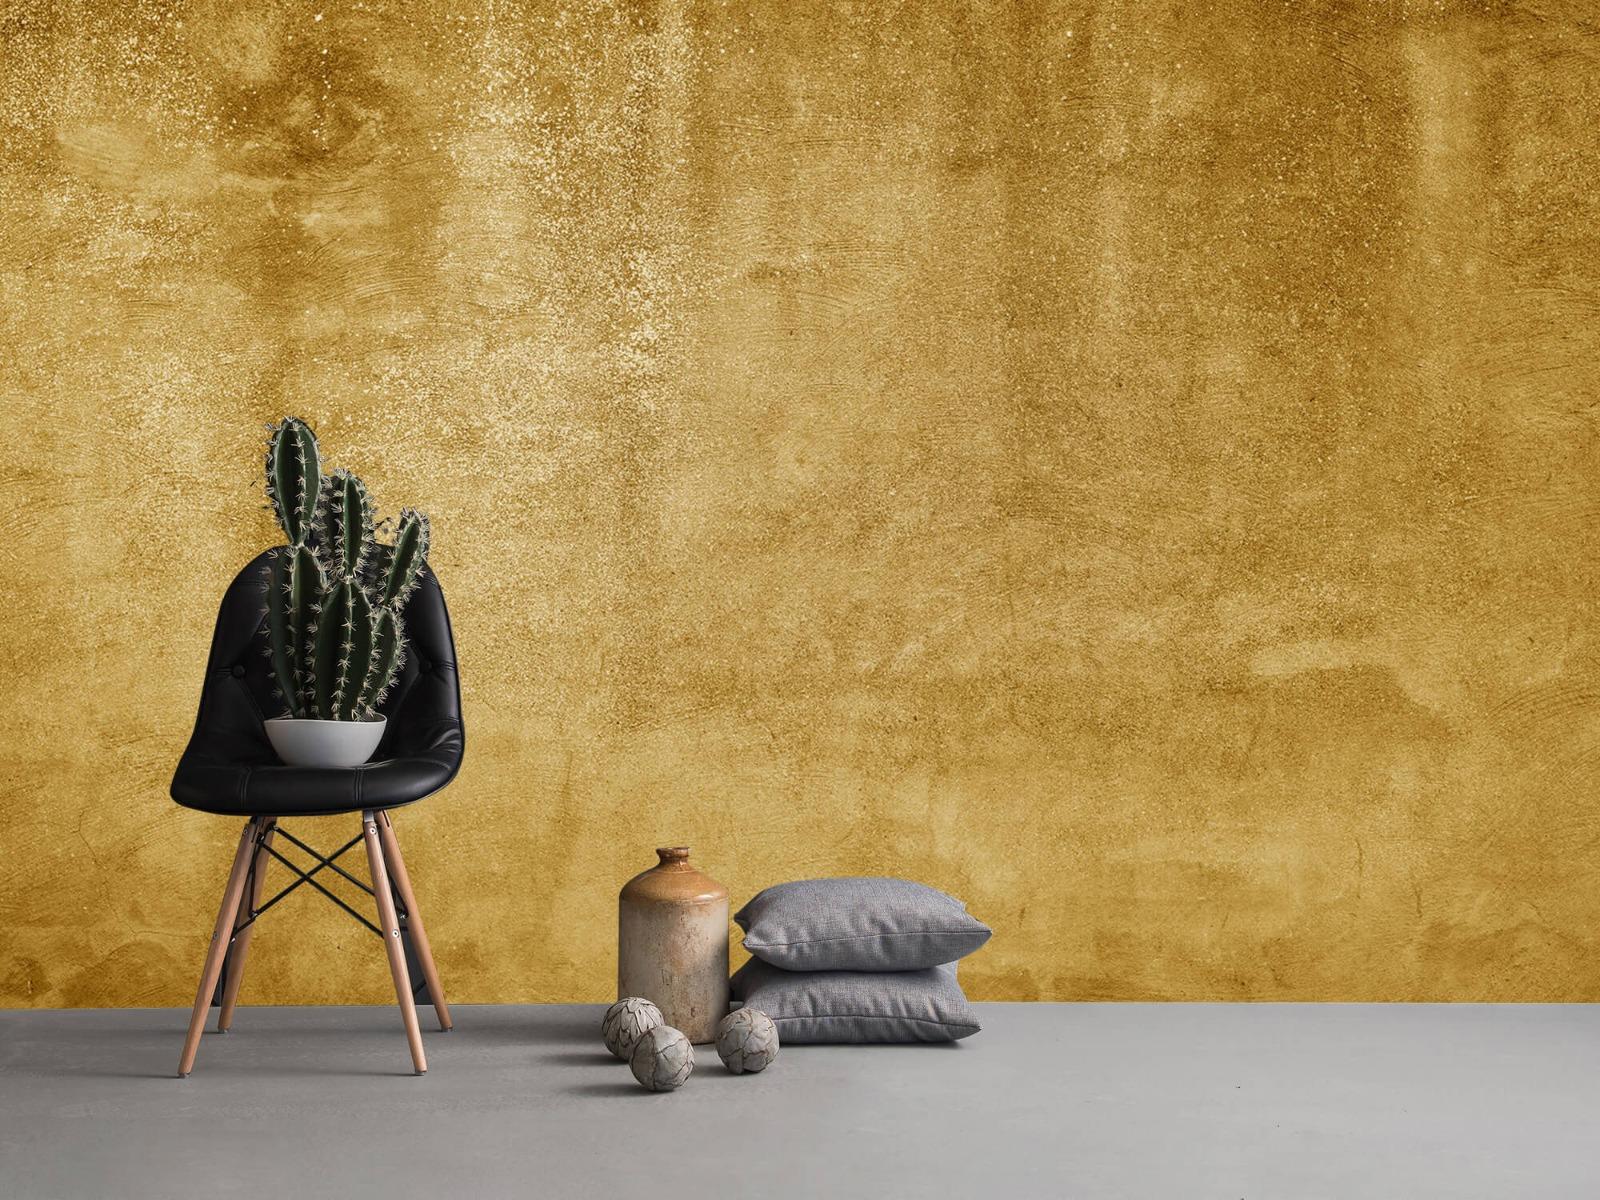 Betonlook behang - Oker geel beton - Woonkamer 1